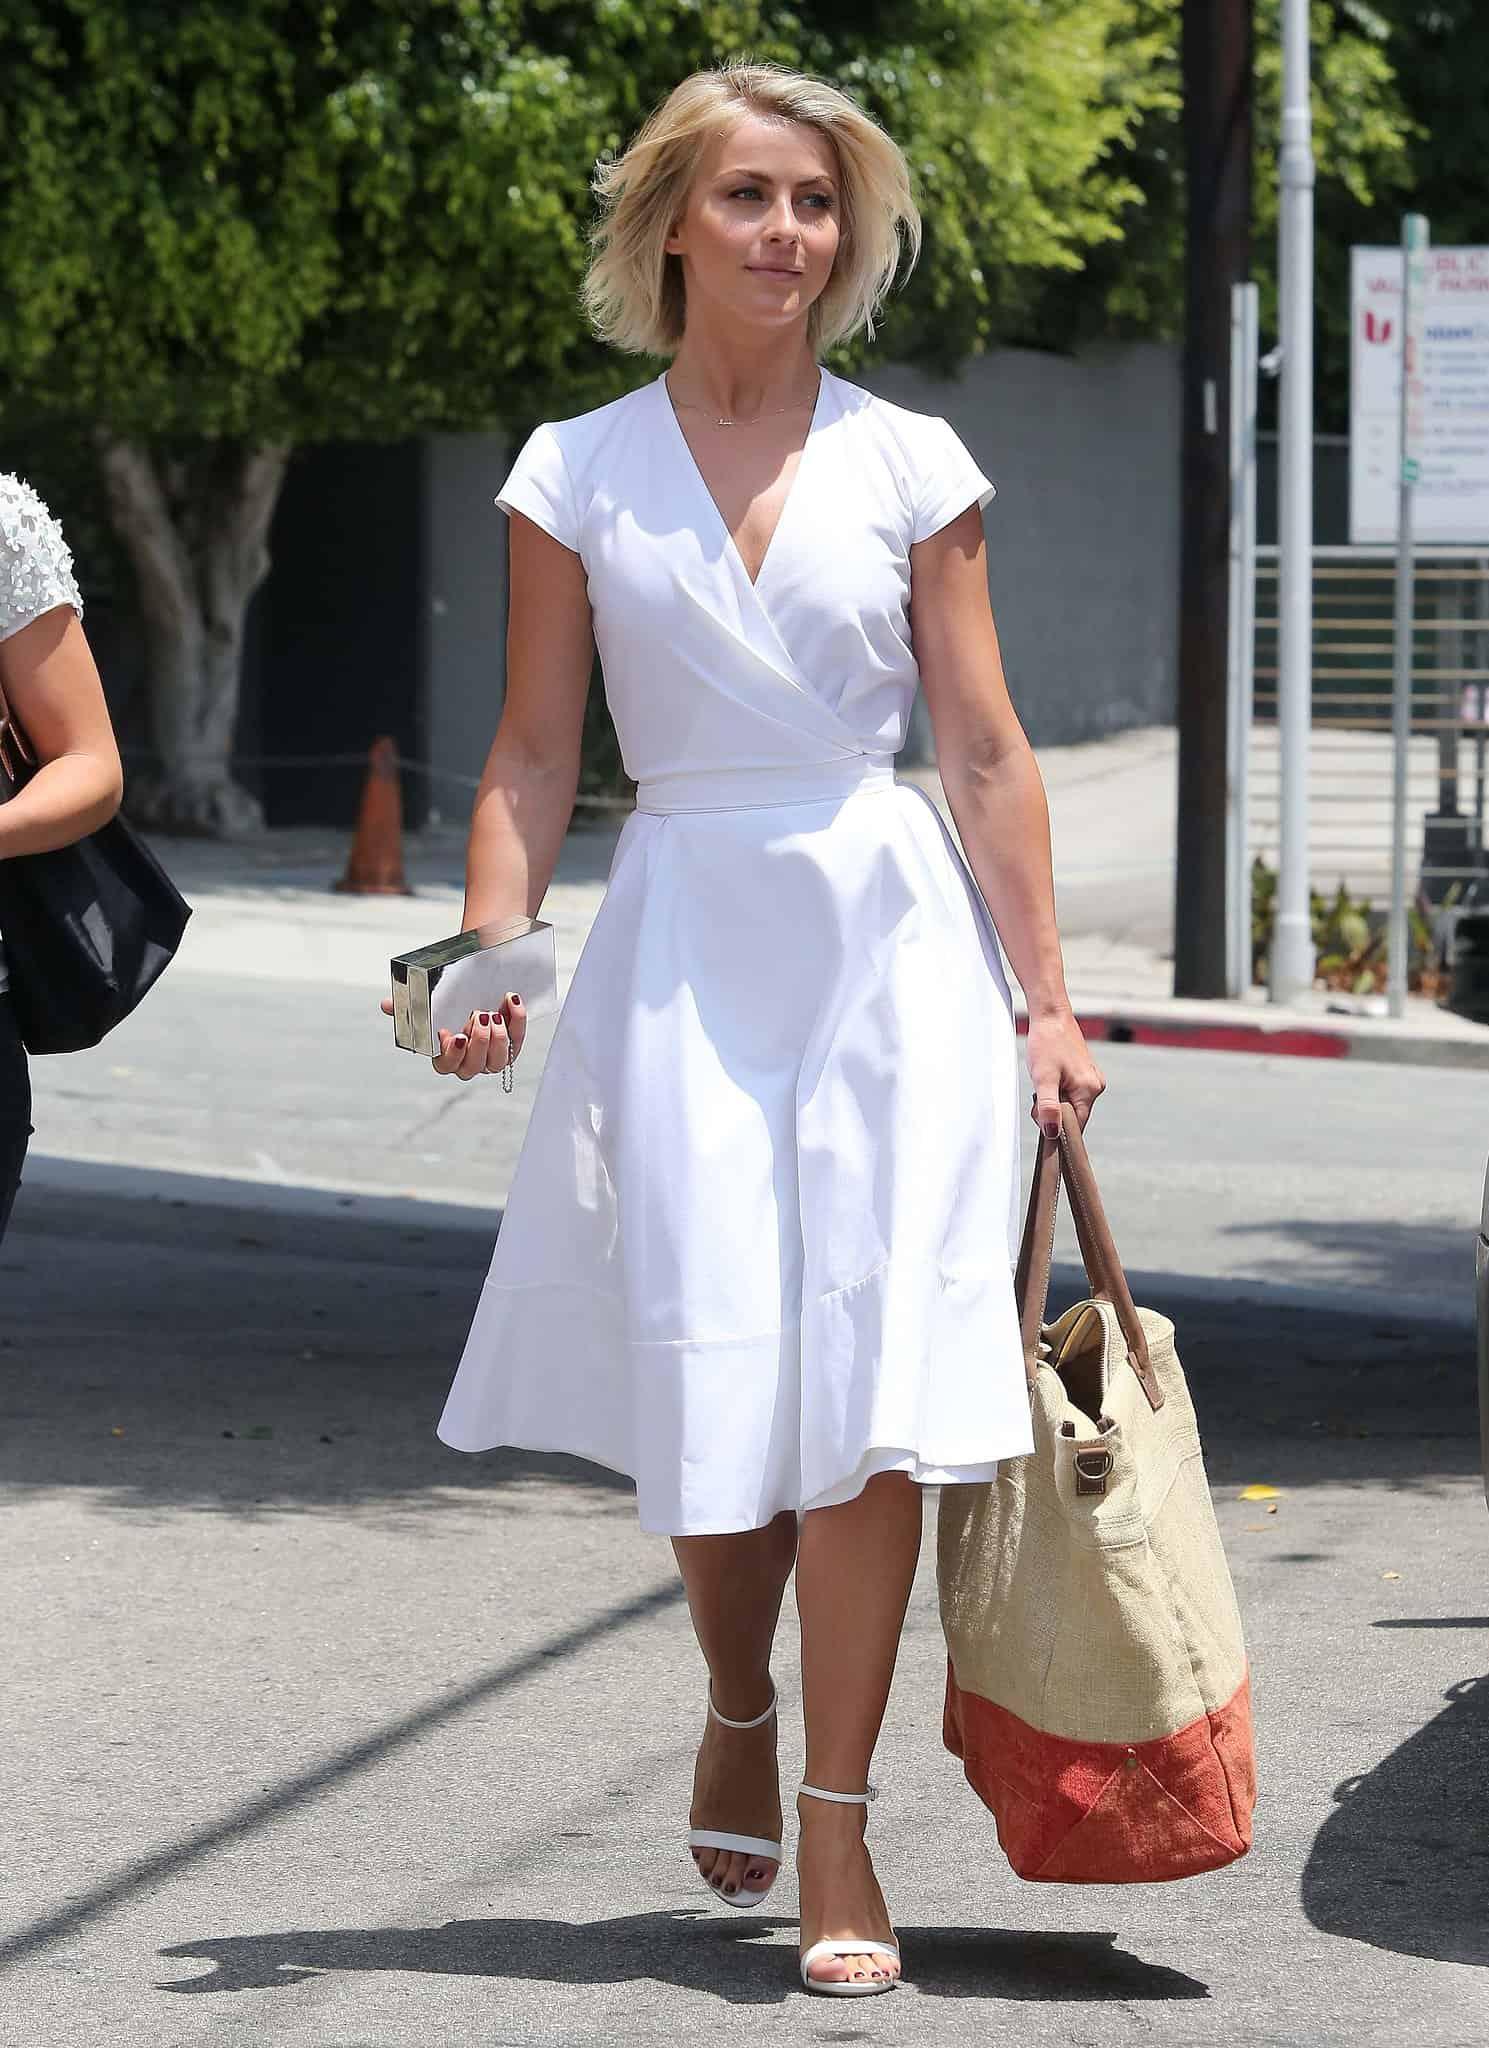 summer-dresses-the-wrap-dress-DVF-style-18